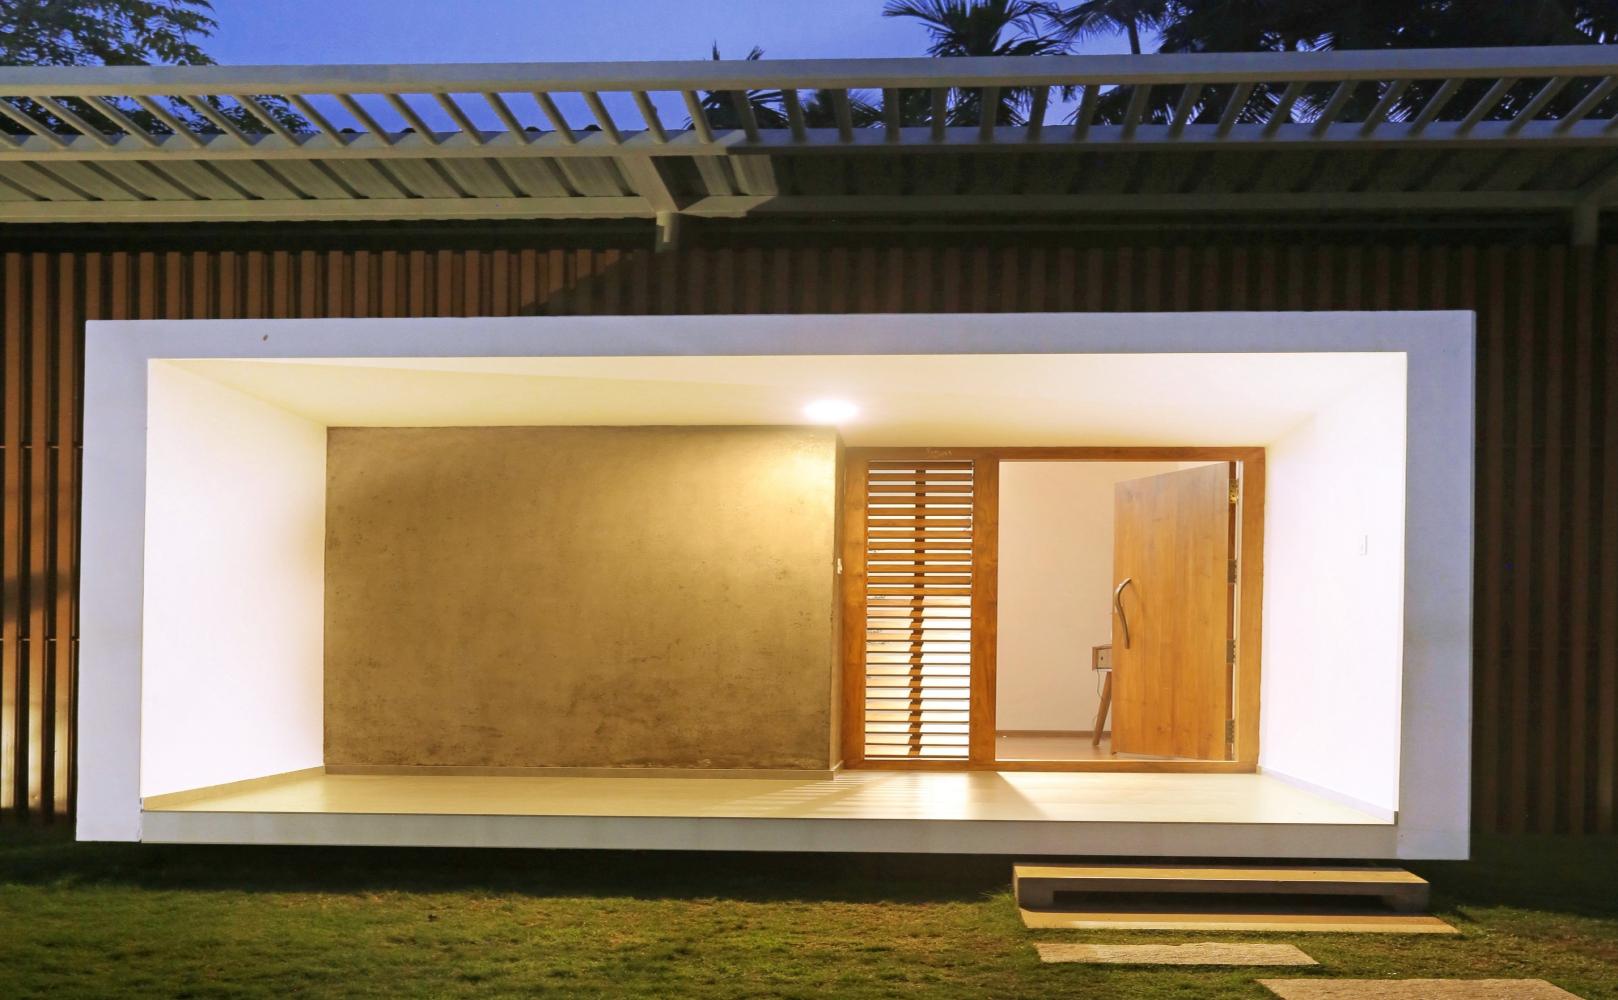 Residence in Perinthalmanna : ZERO STUDIO